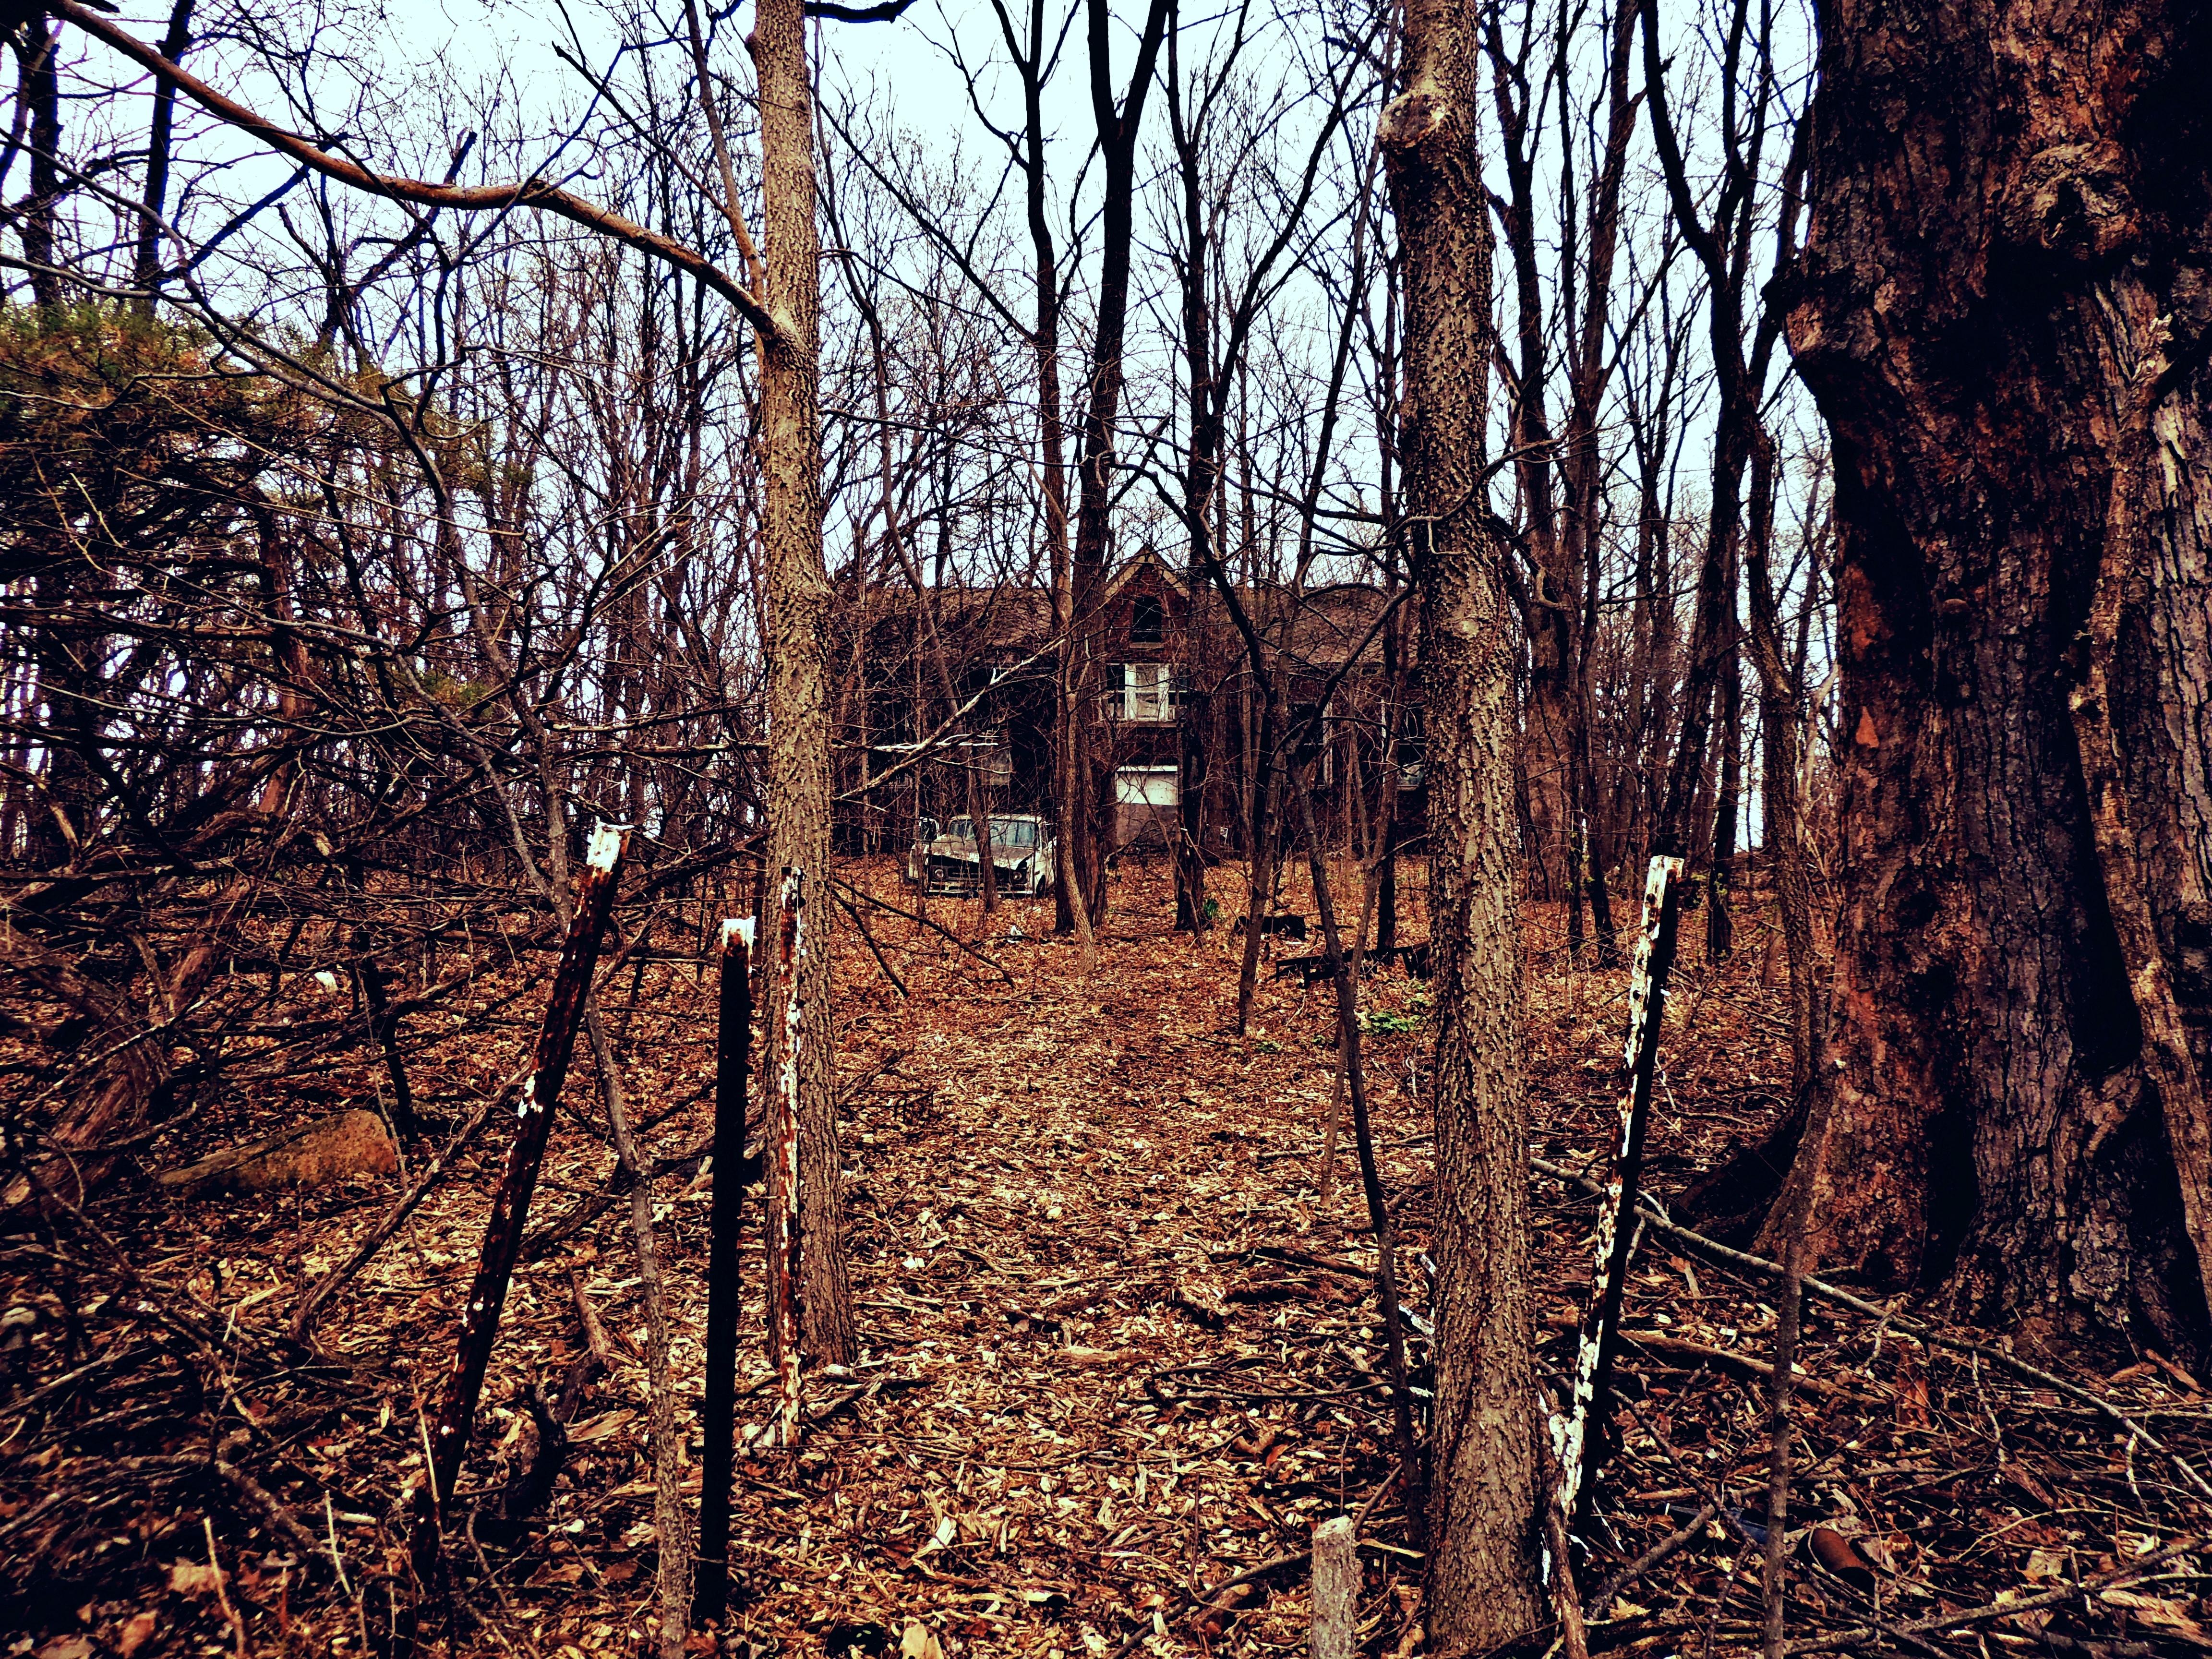 Illinois bureau county dover - School Abandoned Illinois Education Ruins Decay Schoolhouse Ruraldecay Dover Internationalharvester Illinoisabandonment Schoolconsolidation